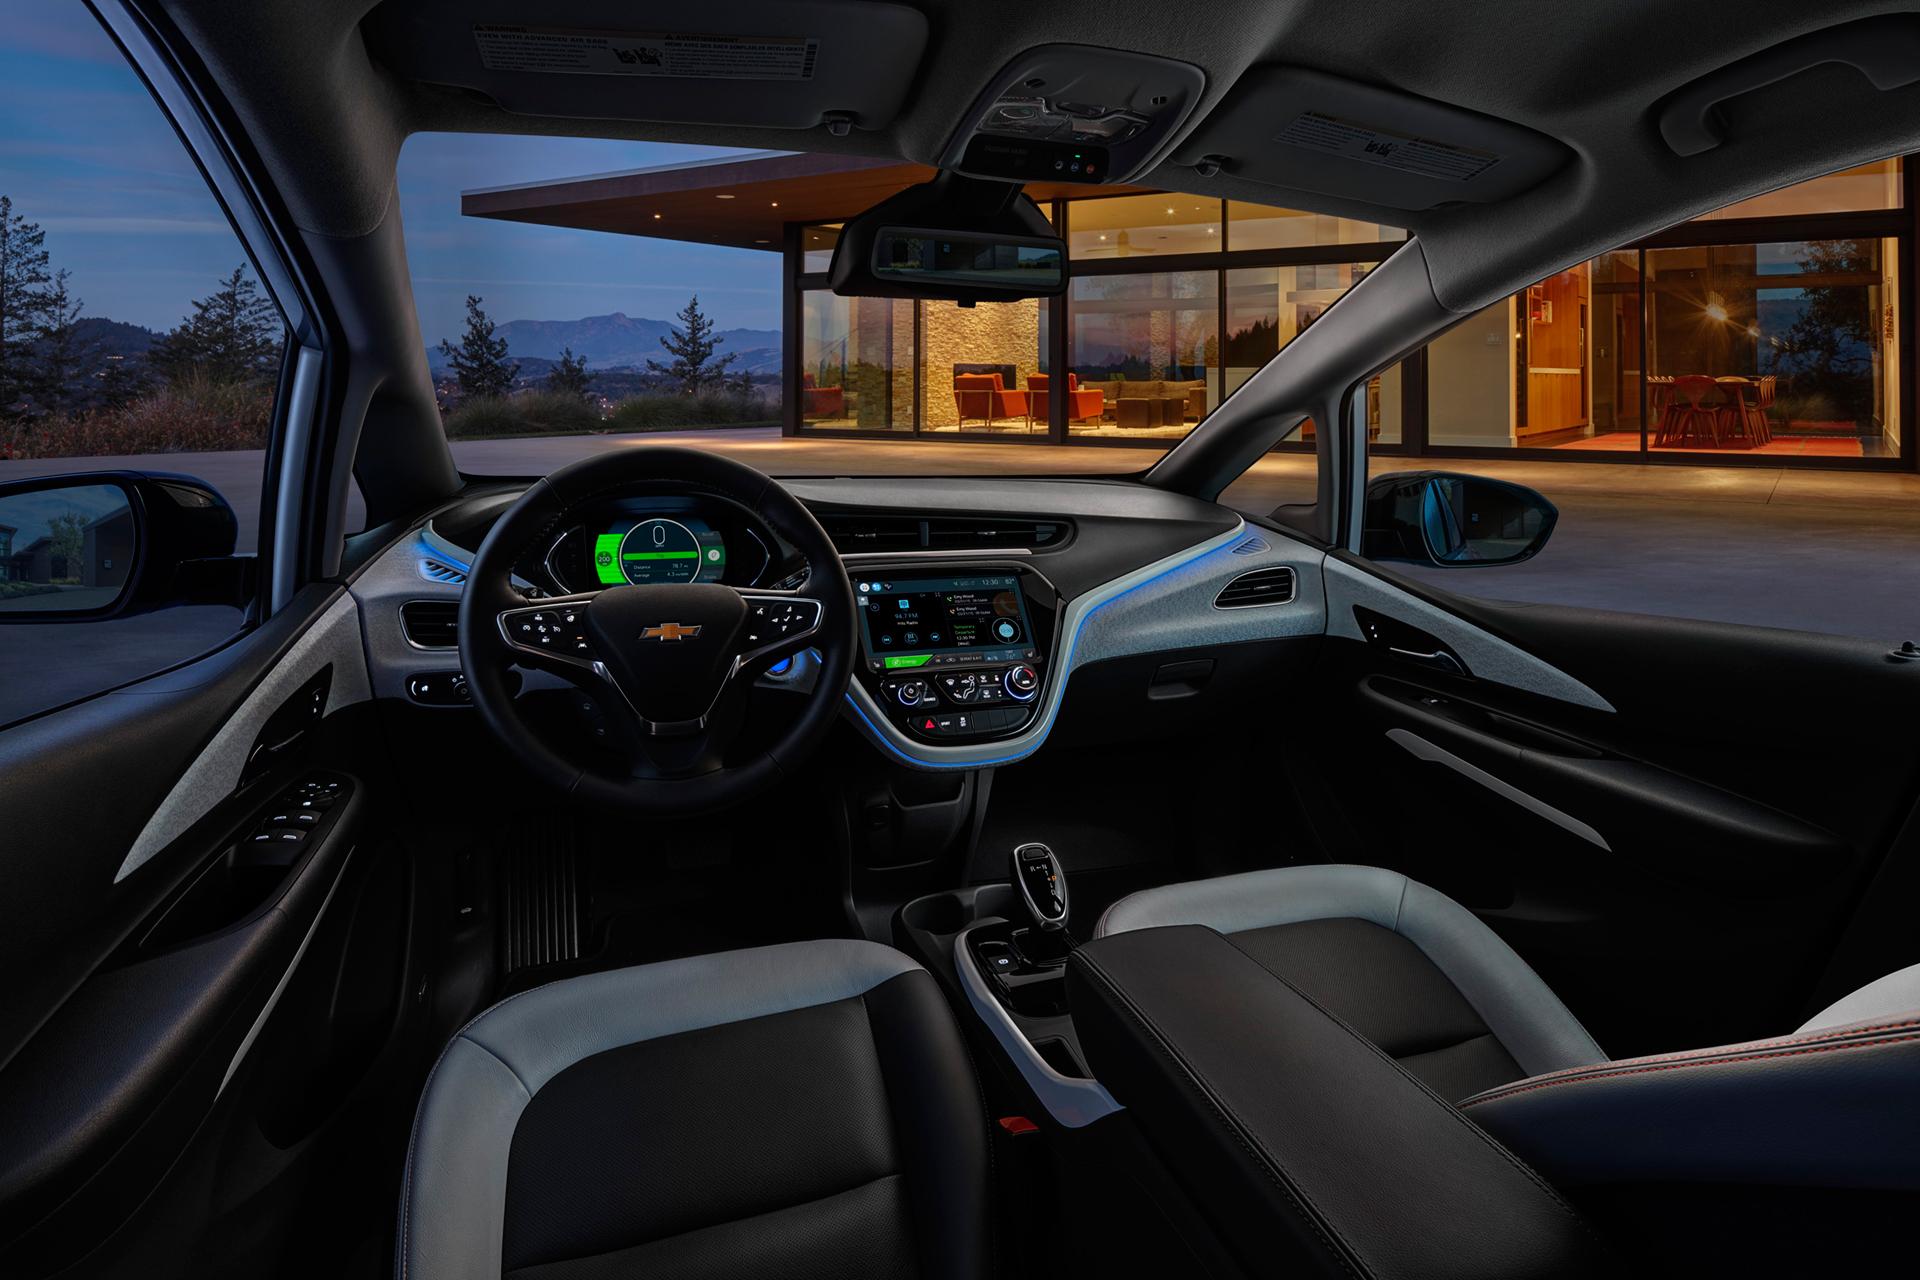 Chevrolet Bolt EV - 2016 - interior / intérieur - General Motors